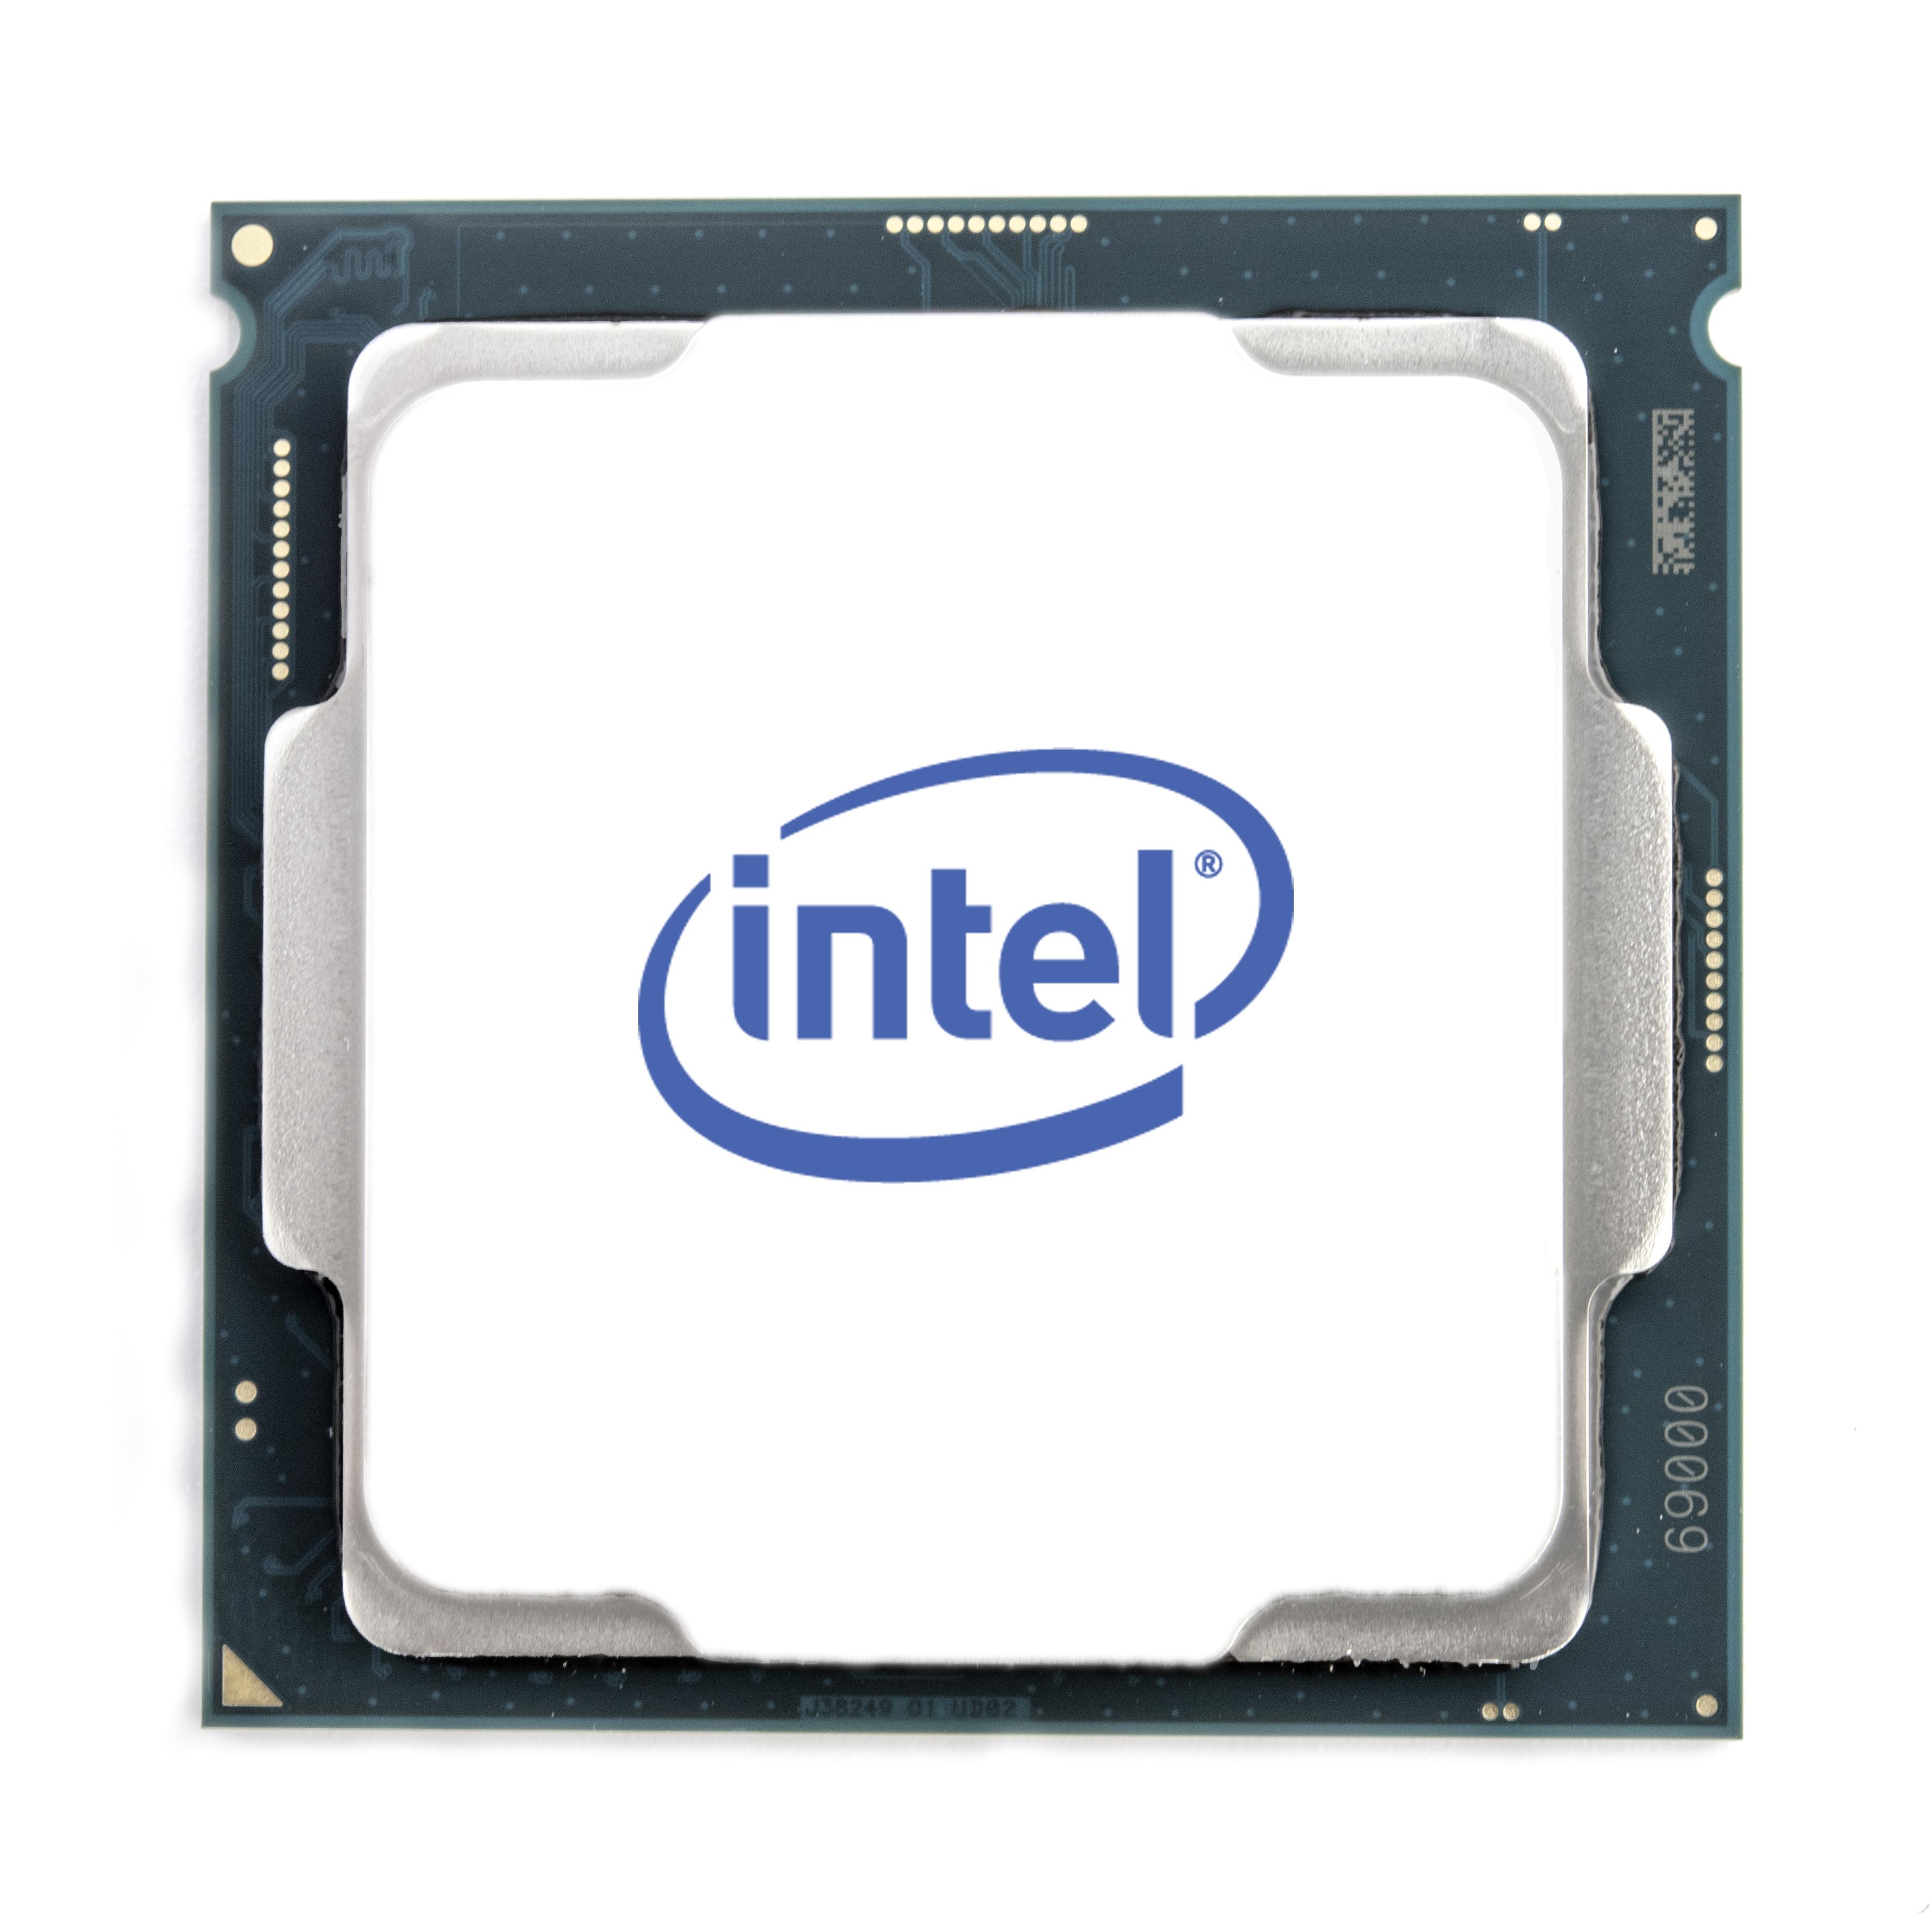 Intel Core i9 9900K - 3.6 GHz - 8 Kerne - 16 Threads - 16 MB Cache-Speicher - LGA1151 Socket - Box (ohne Kühler)